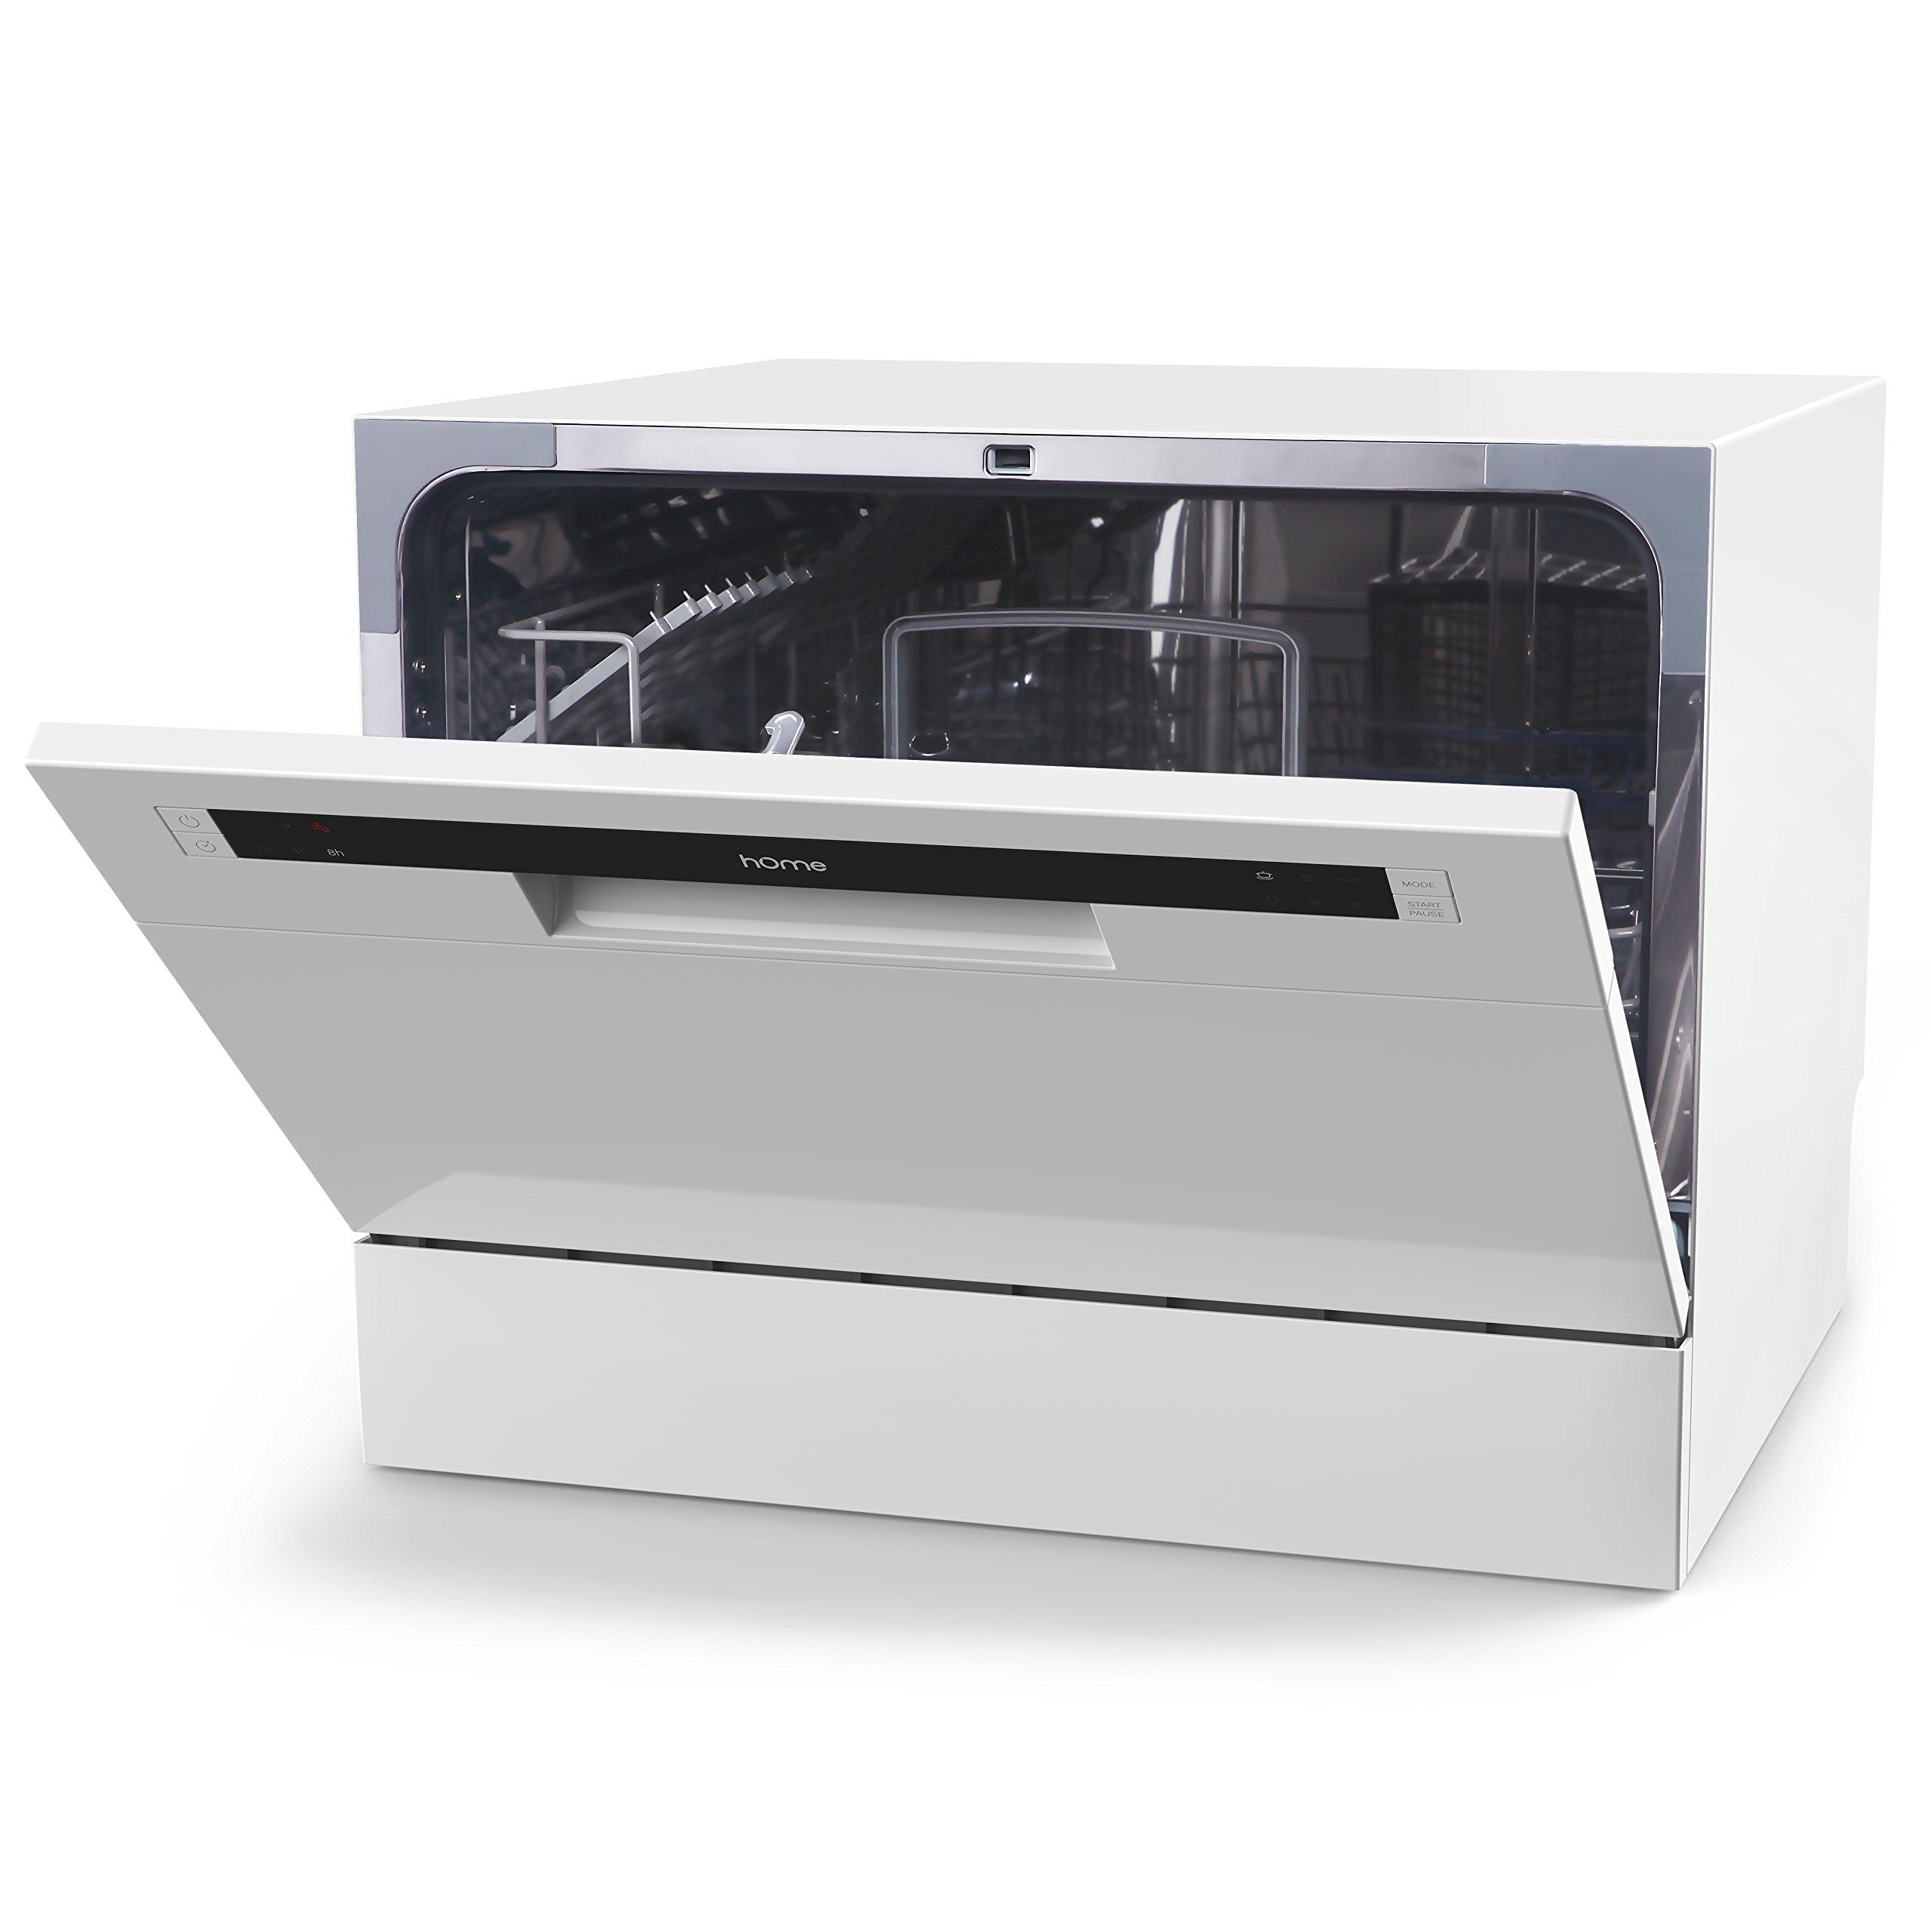 hOmeLabs Compact Countertop Dishwasher - Energy Star ...